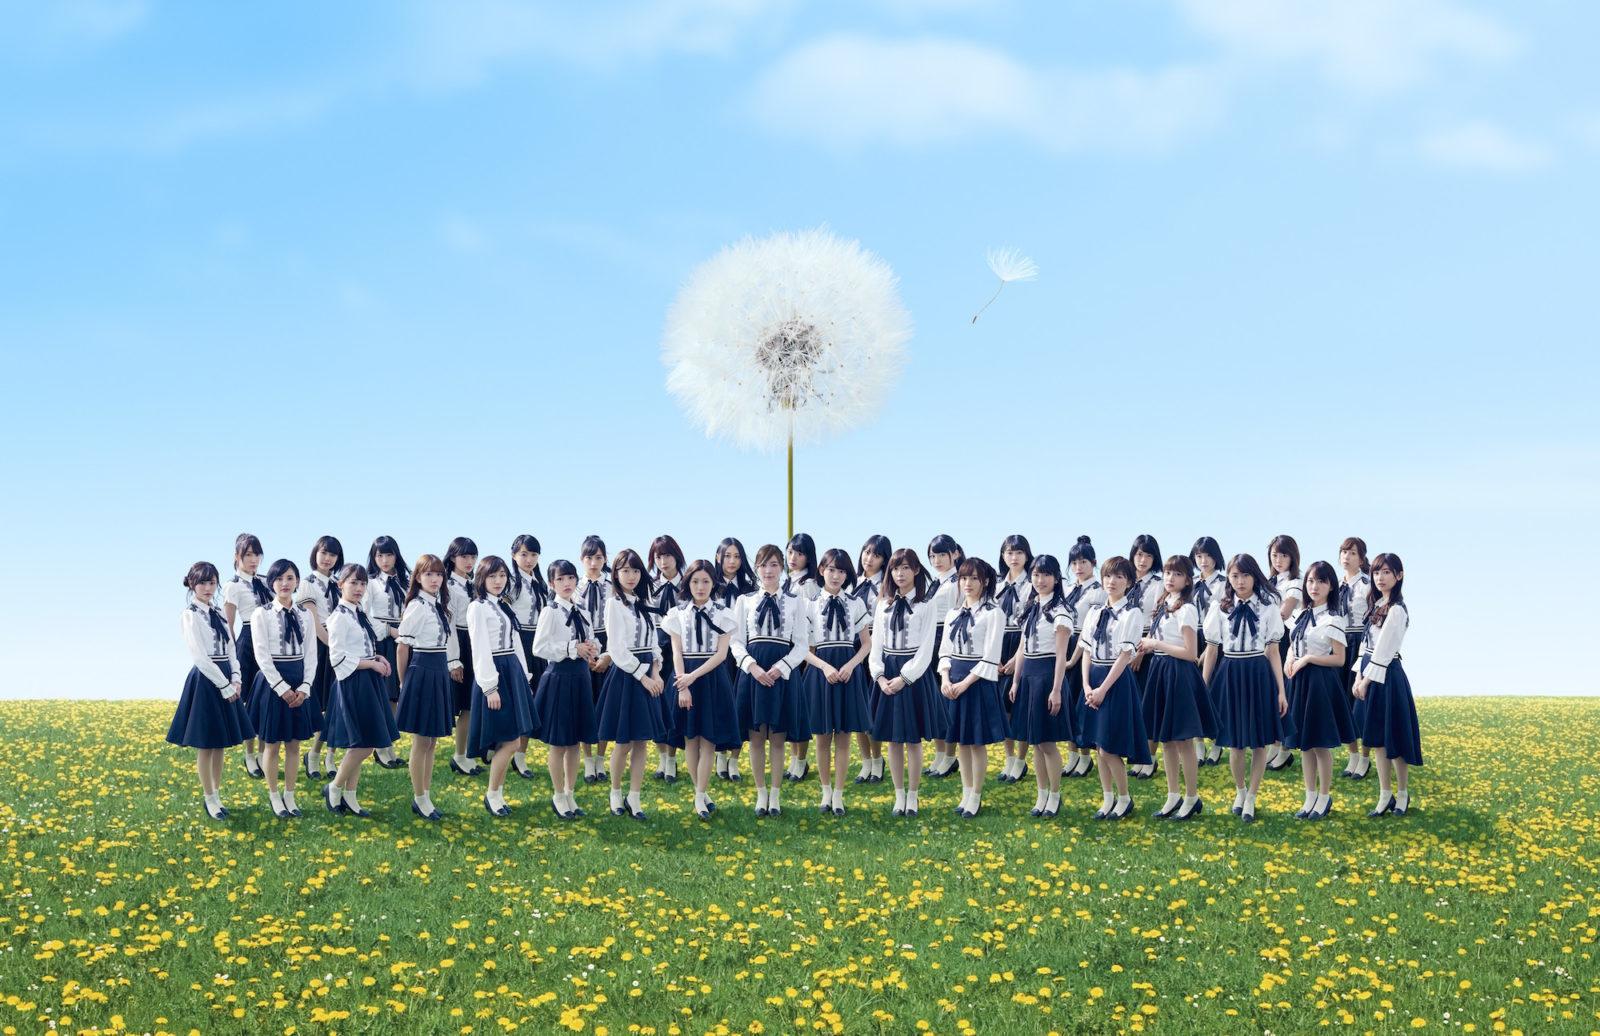 AKB48・木崎ゆりあのおバカ発言にさんまも爆笑「ナガシマ県ってあんの?」サムネイル画像